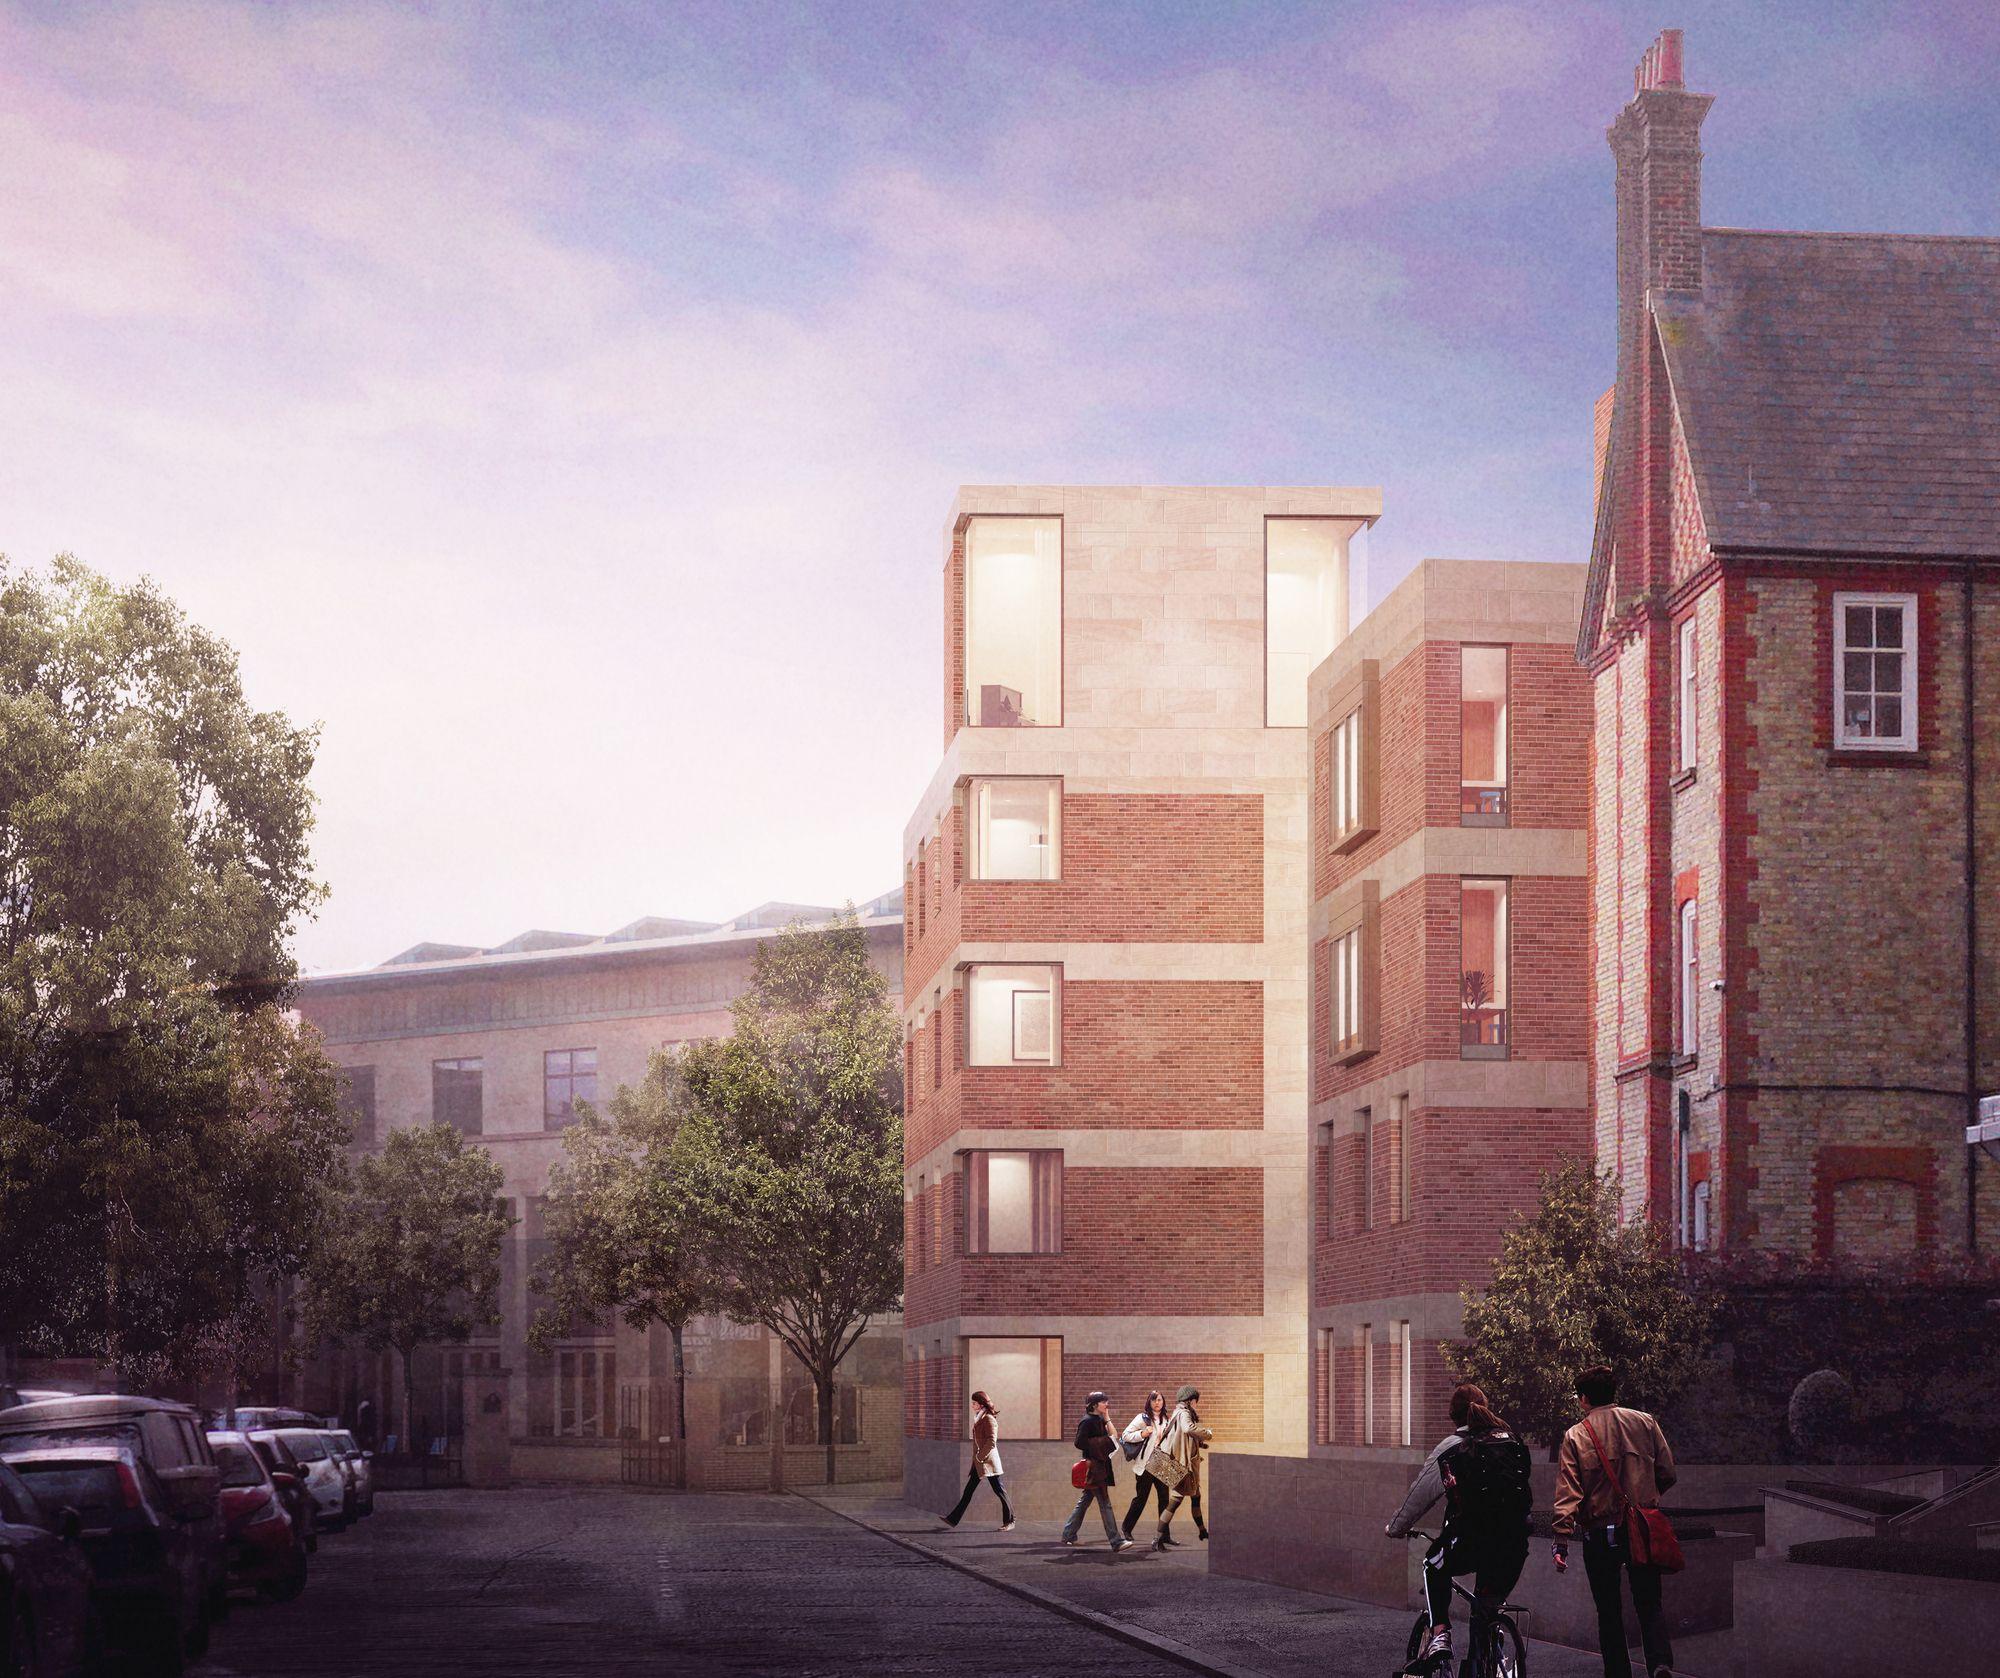 Oxford Unveils 5 Proposals Seeking to Overhaul St Hilda's College